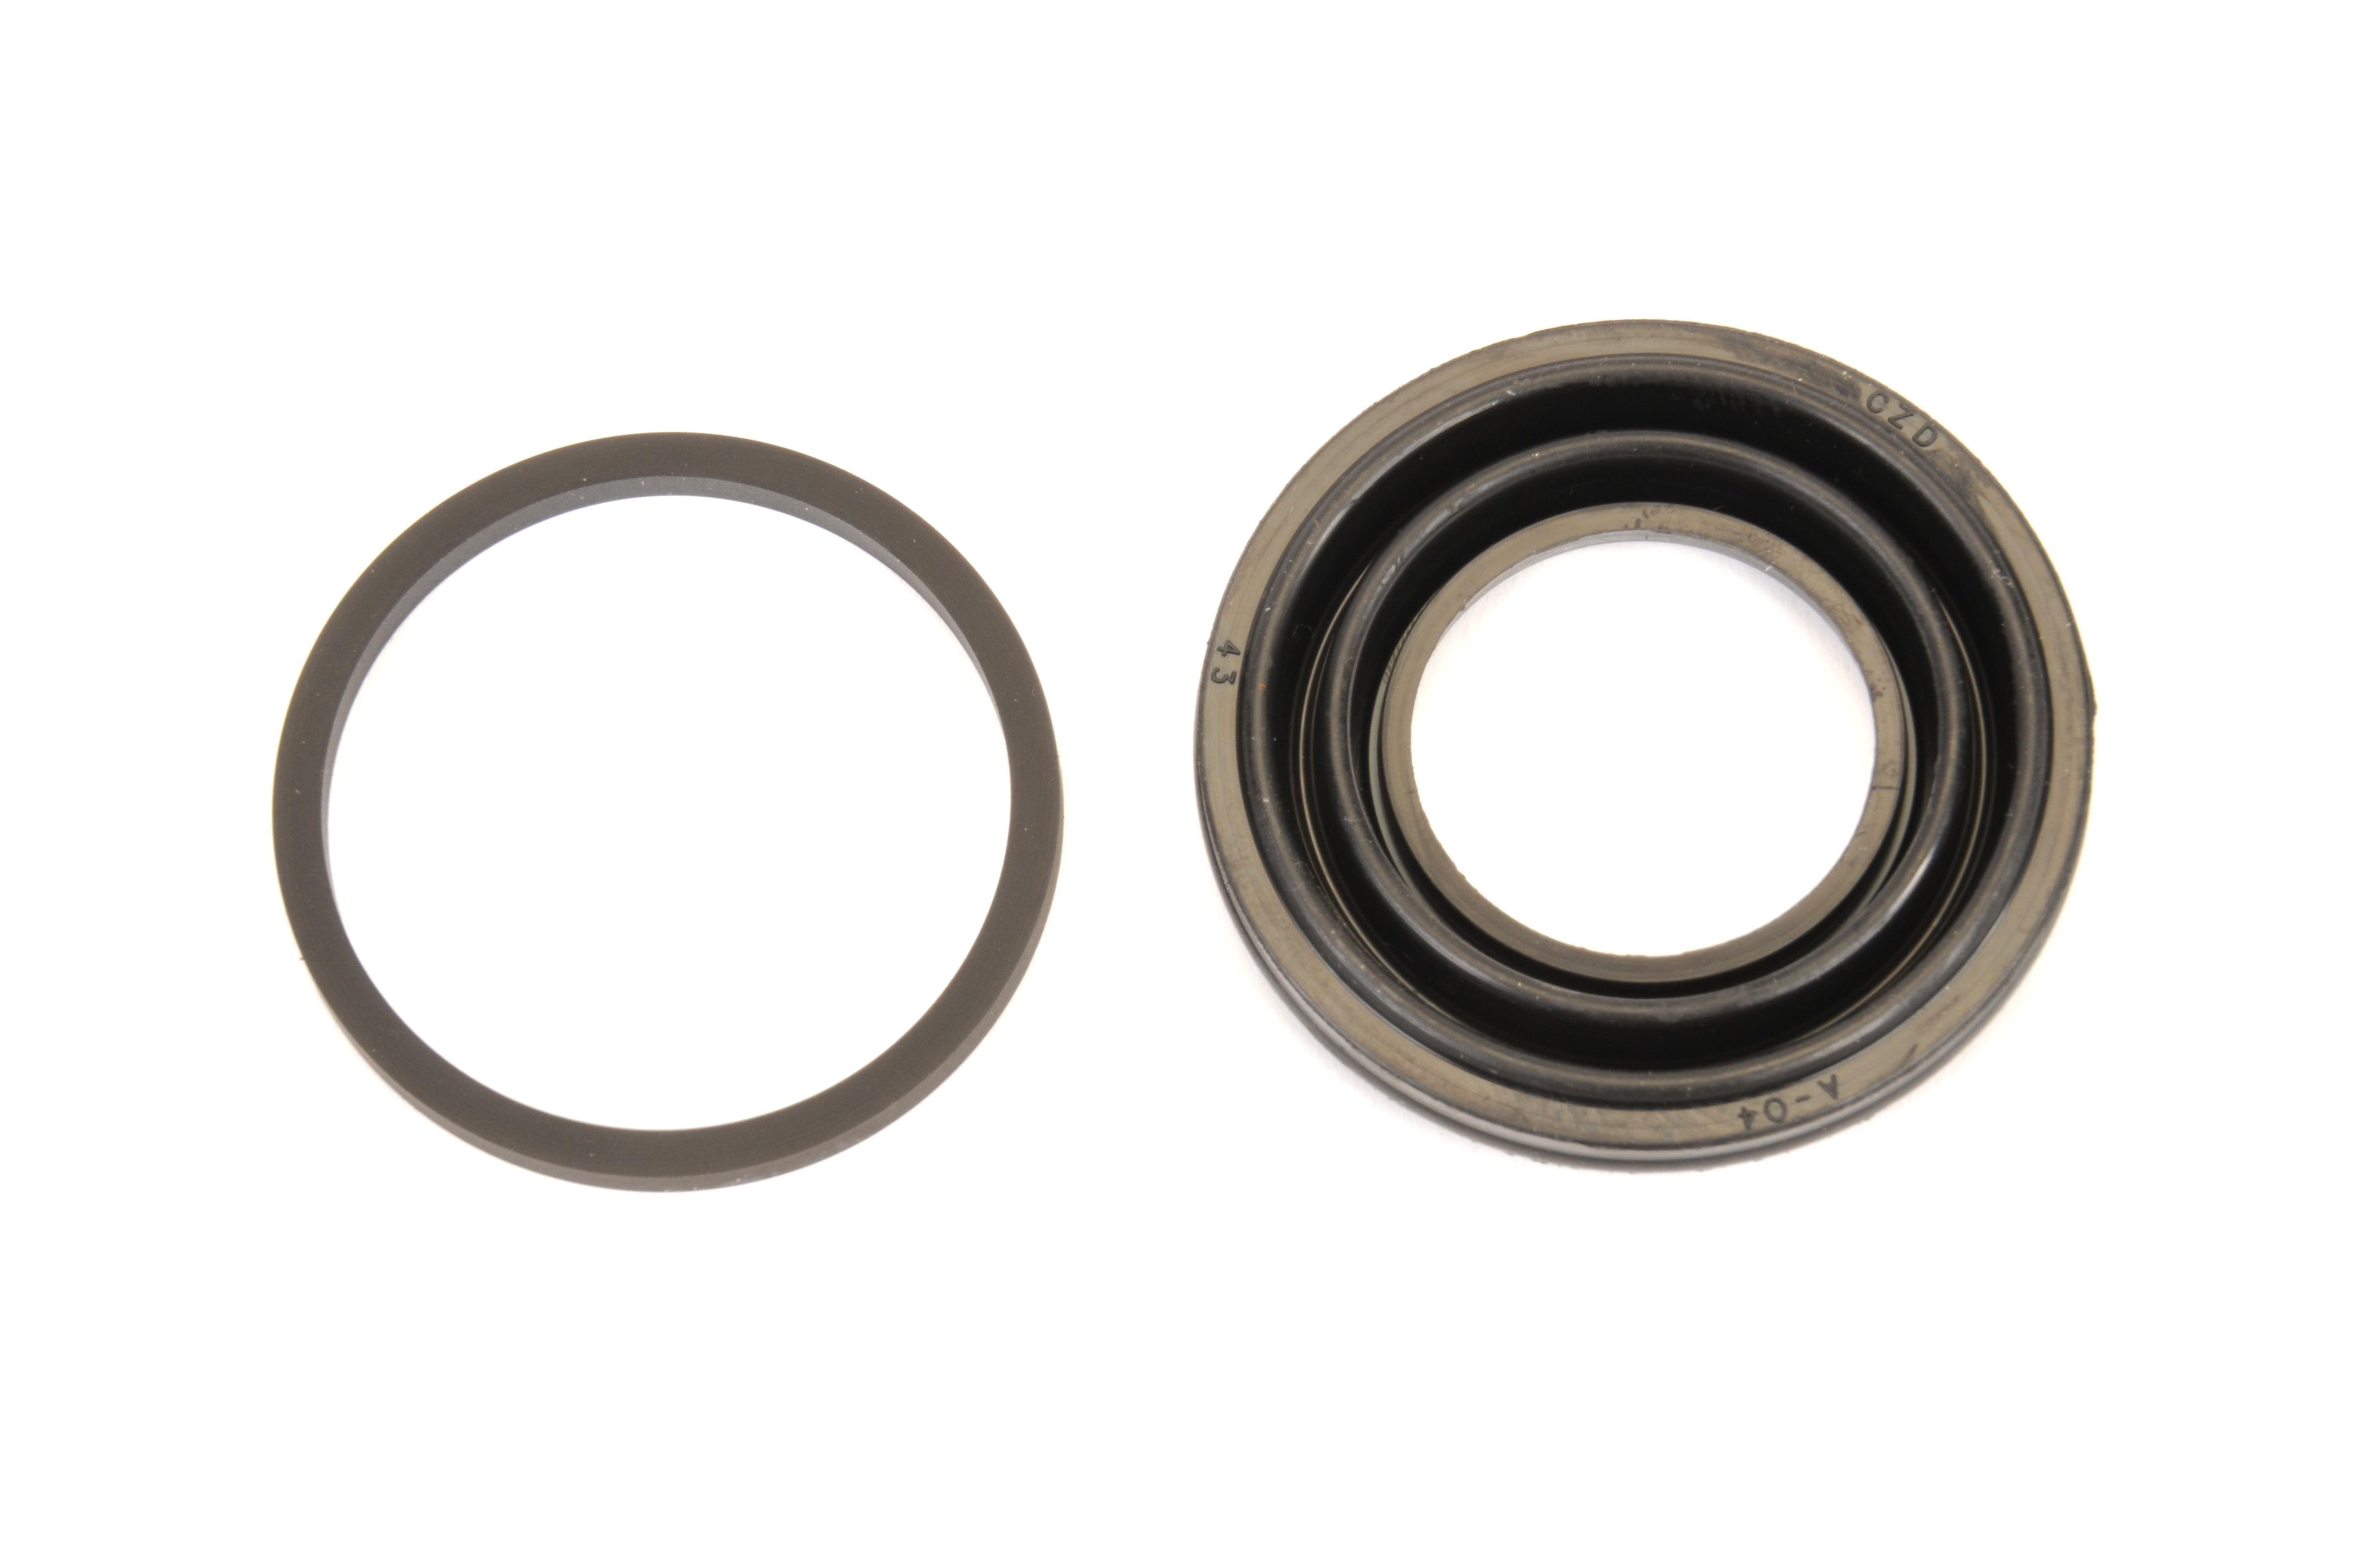 ACDELCO GM ORIGINAL EQUIPMENT - Disc Brake Caliper Piston Seal Kit - DCB 179-2260